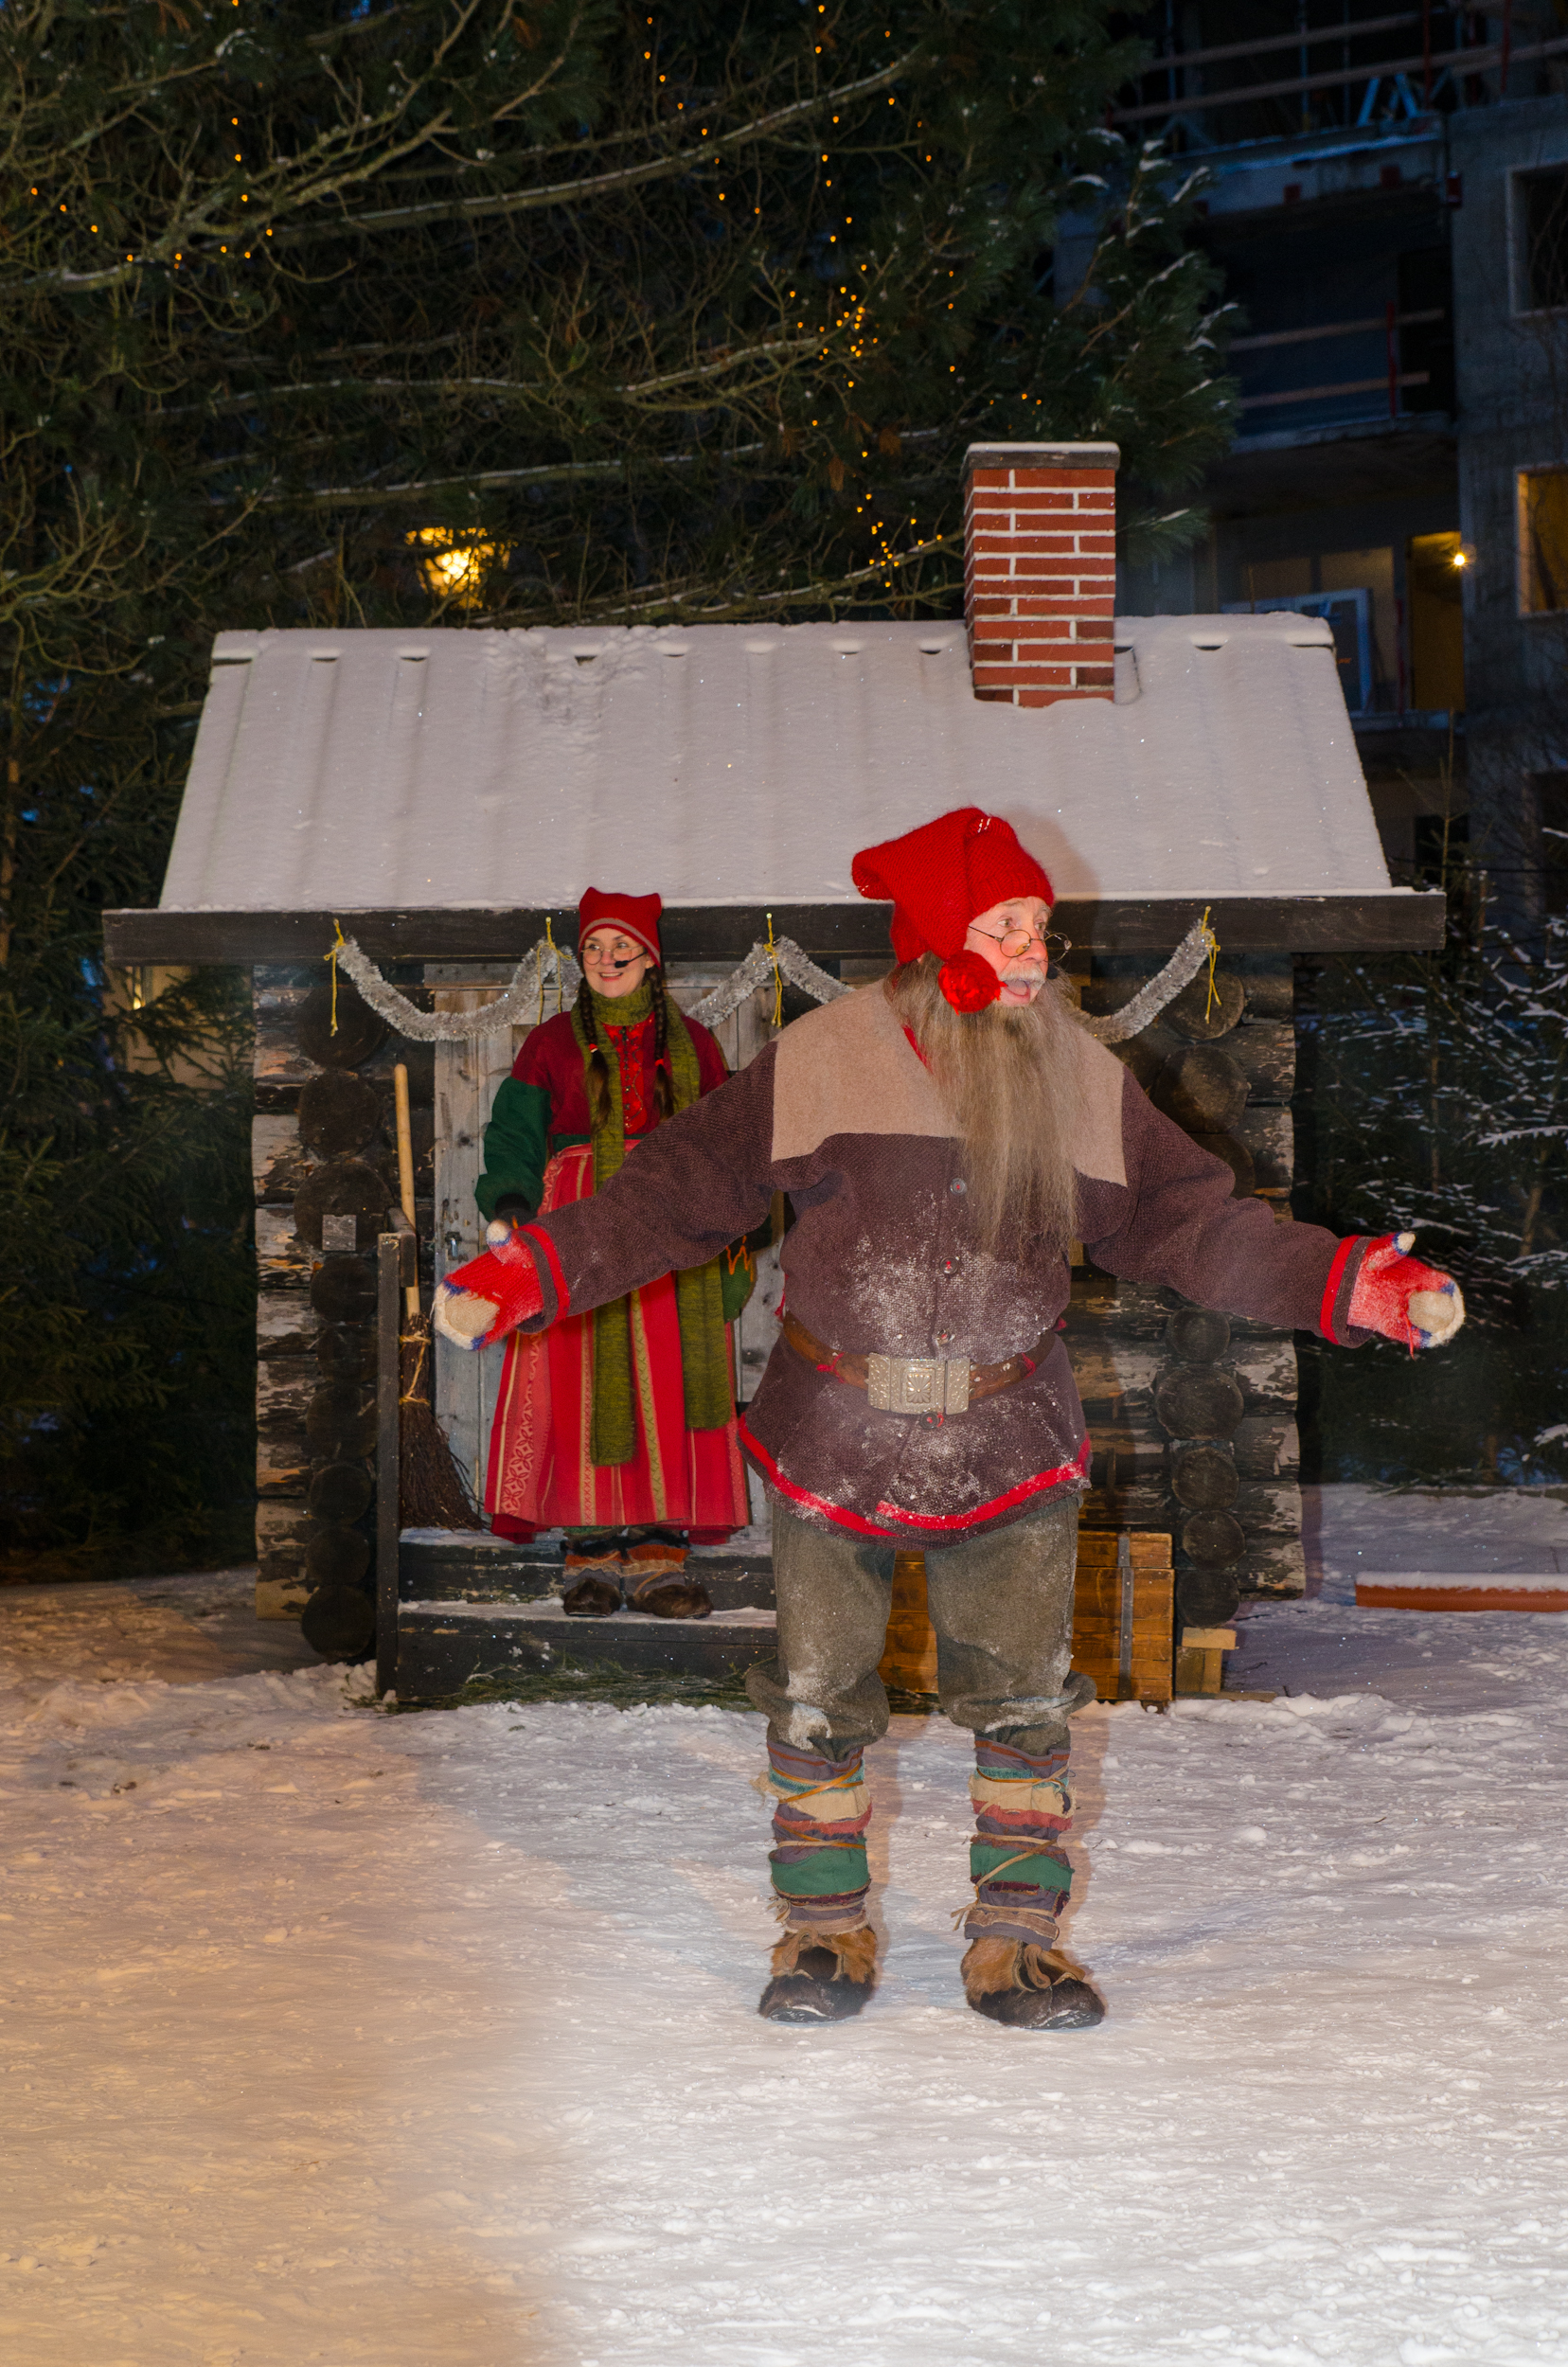 julkalendern i stadsparken Luleåjulkalendern i stadsparken Luleå